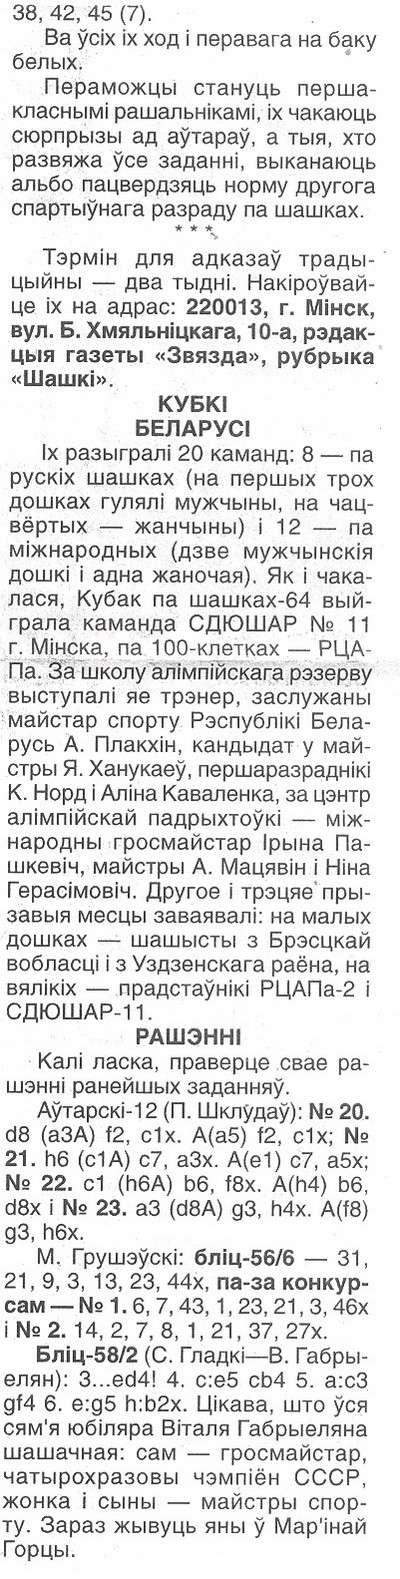 Звязда (Минск) 11020211